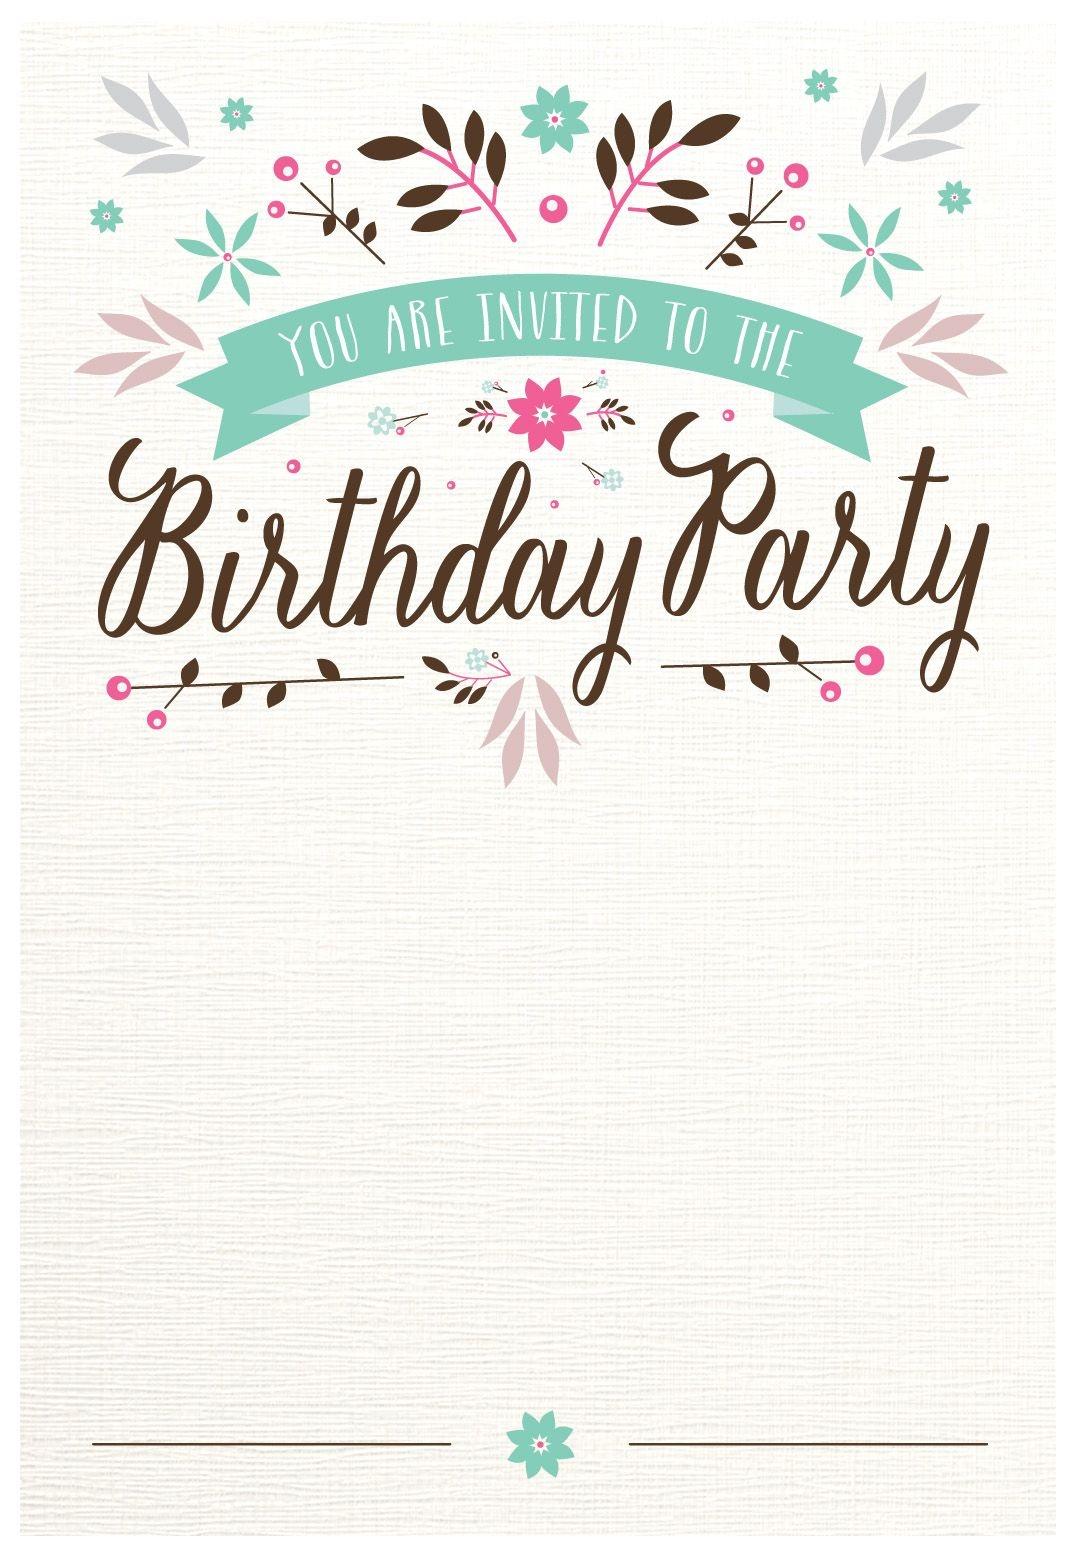 Flat Floral - Free Printable Birthday Invitation Template - Free Printable Birthday Invitations Pinterest